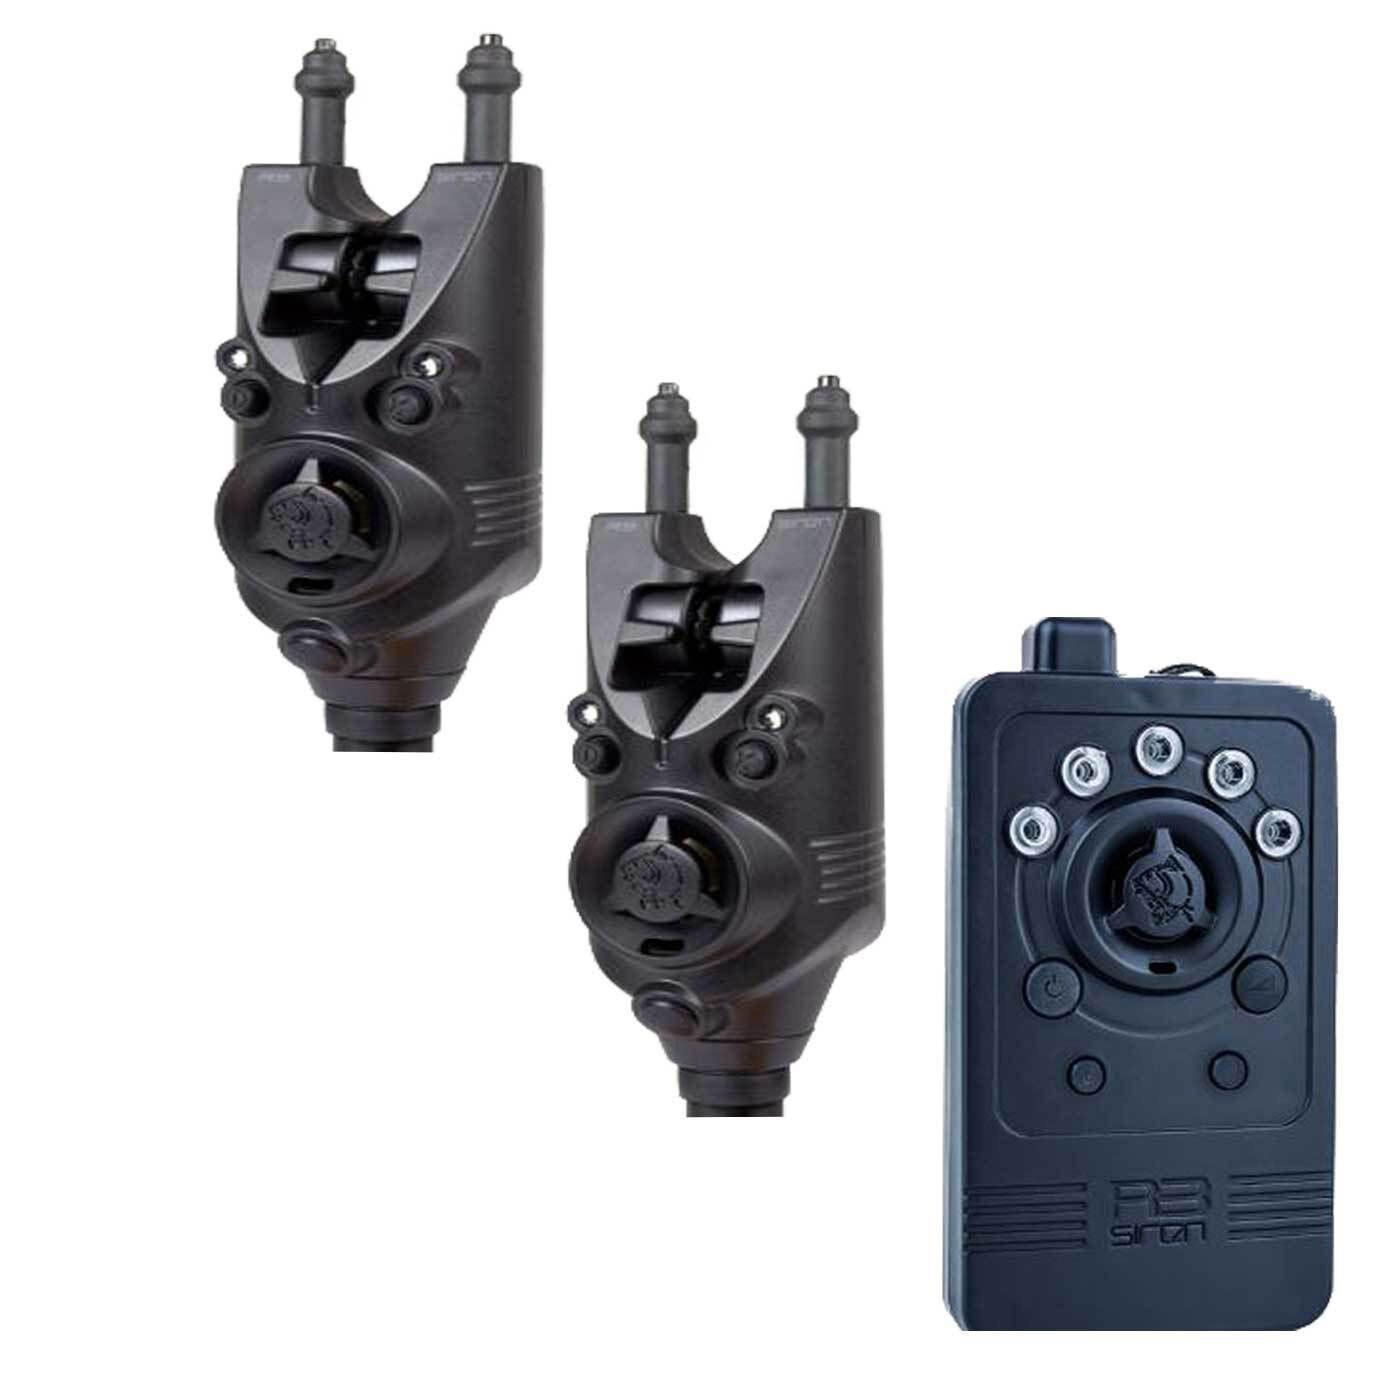 Nash Siren R3 x 2 Alarme R3 Receiver Brand New